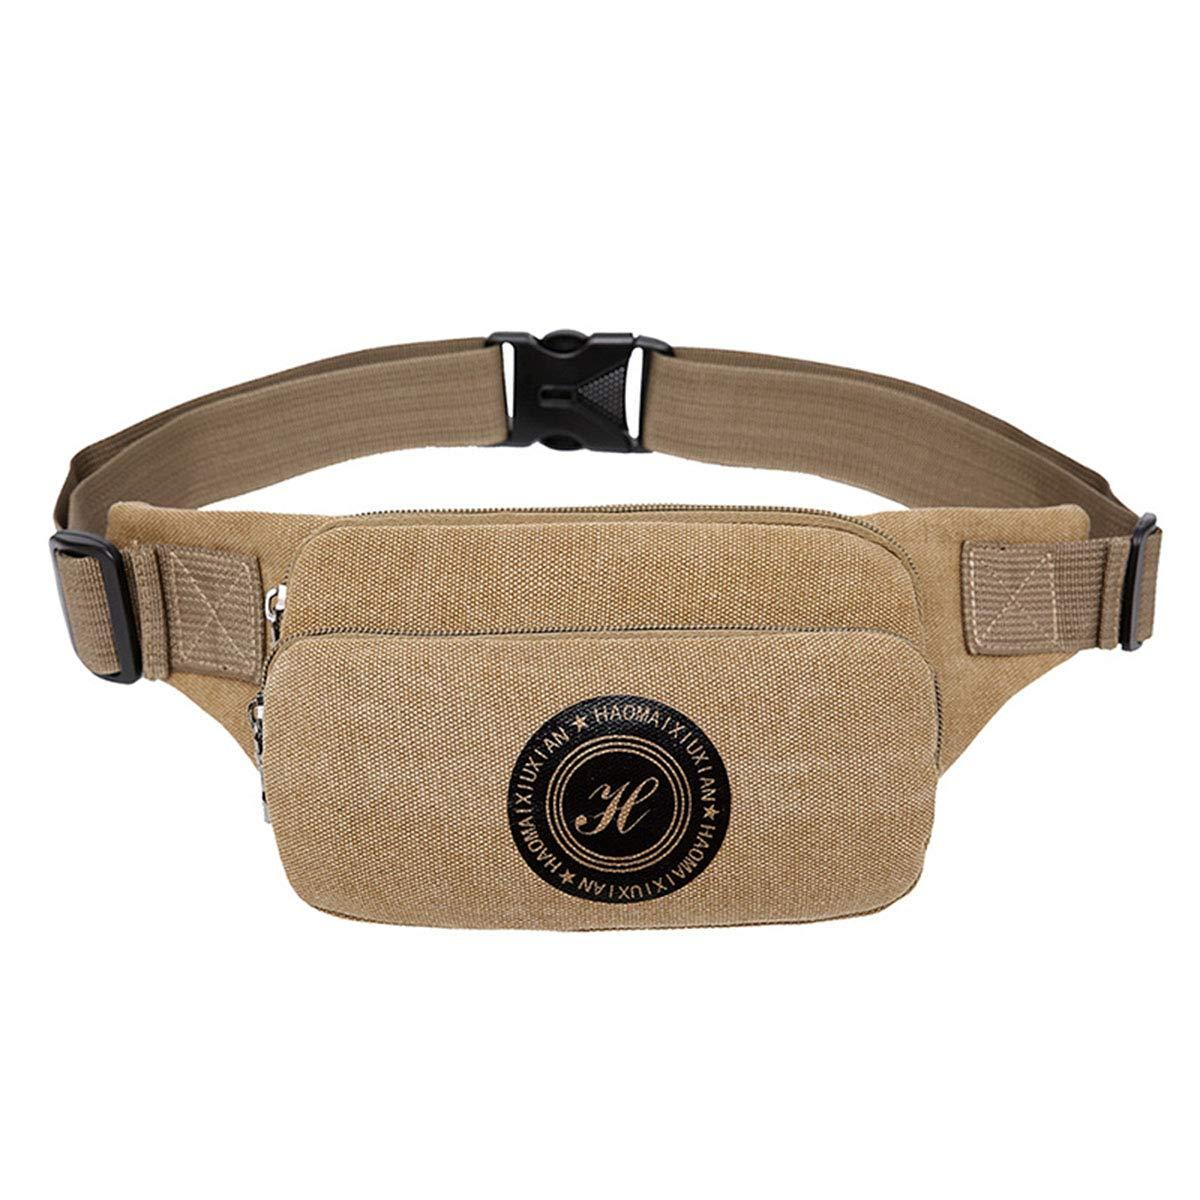 Multifunction Bumbag Fanny Packs 3 Zip Large Capacity Pockets Running Hiking Outdoor Sport Waist Bag Money Hip Pouch Pack for Men Women,Khaki,17713cm